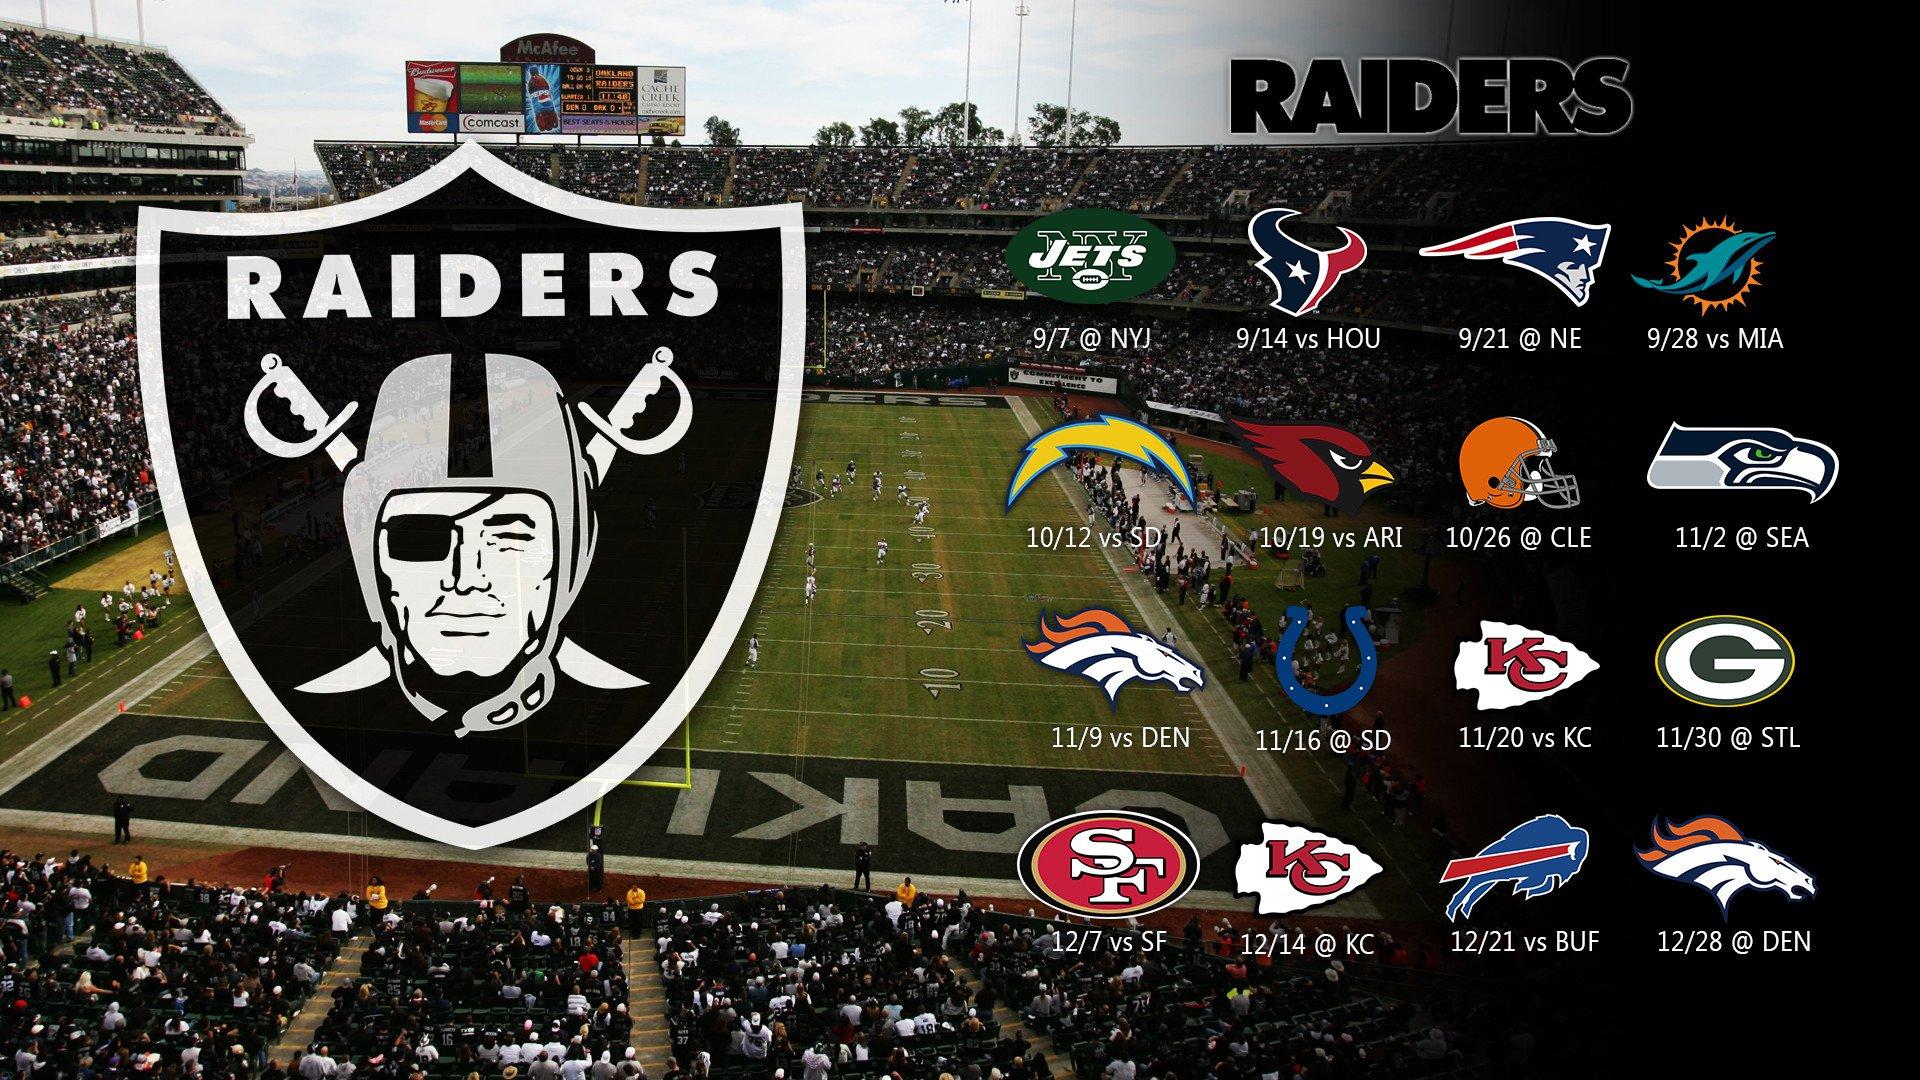 Raiders Schedule 2014 Oakland